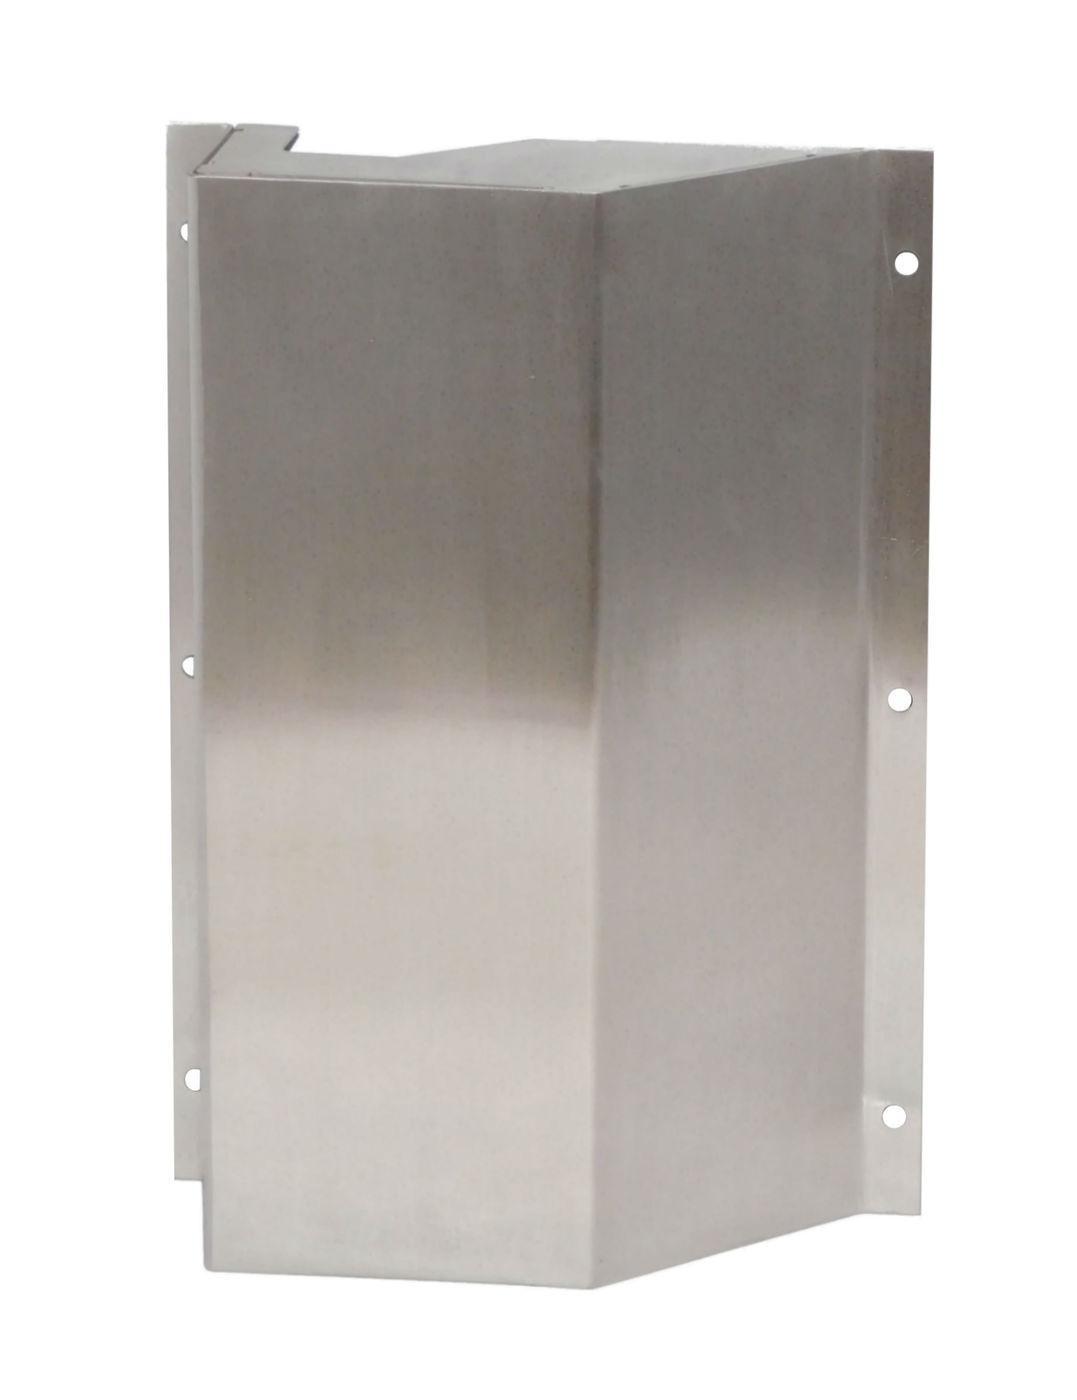 Don-Jo Manufacturing 90-8 X 32-DB 8 x 32 in Duronatic Bronze Aluminum Kick Plate